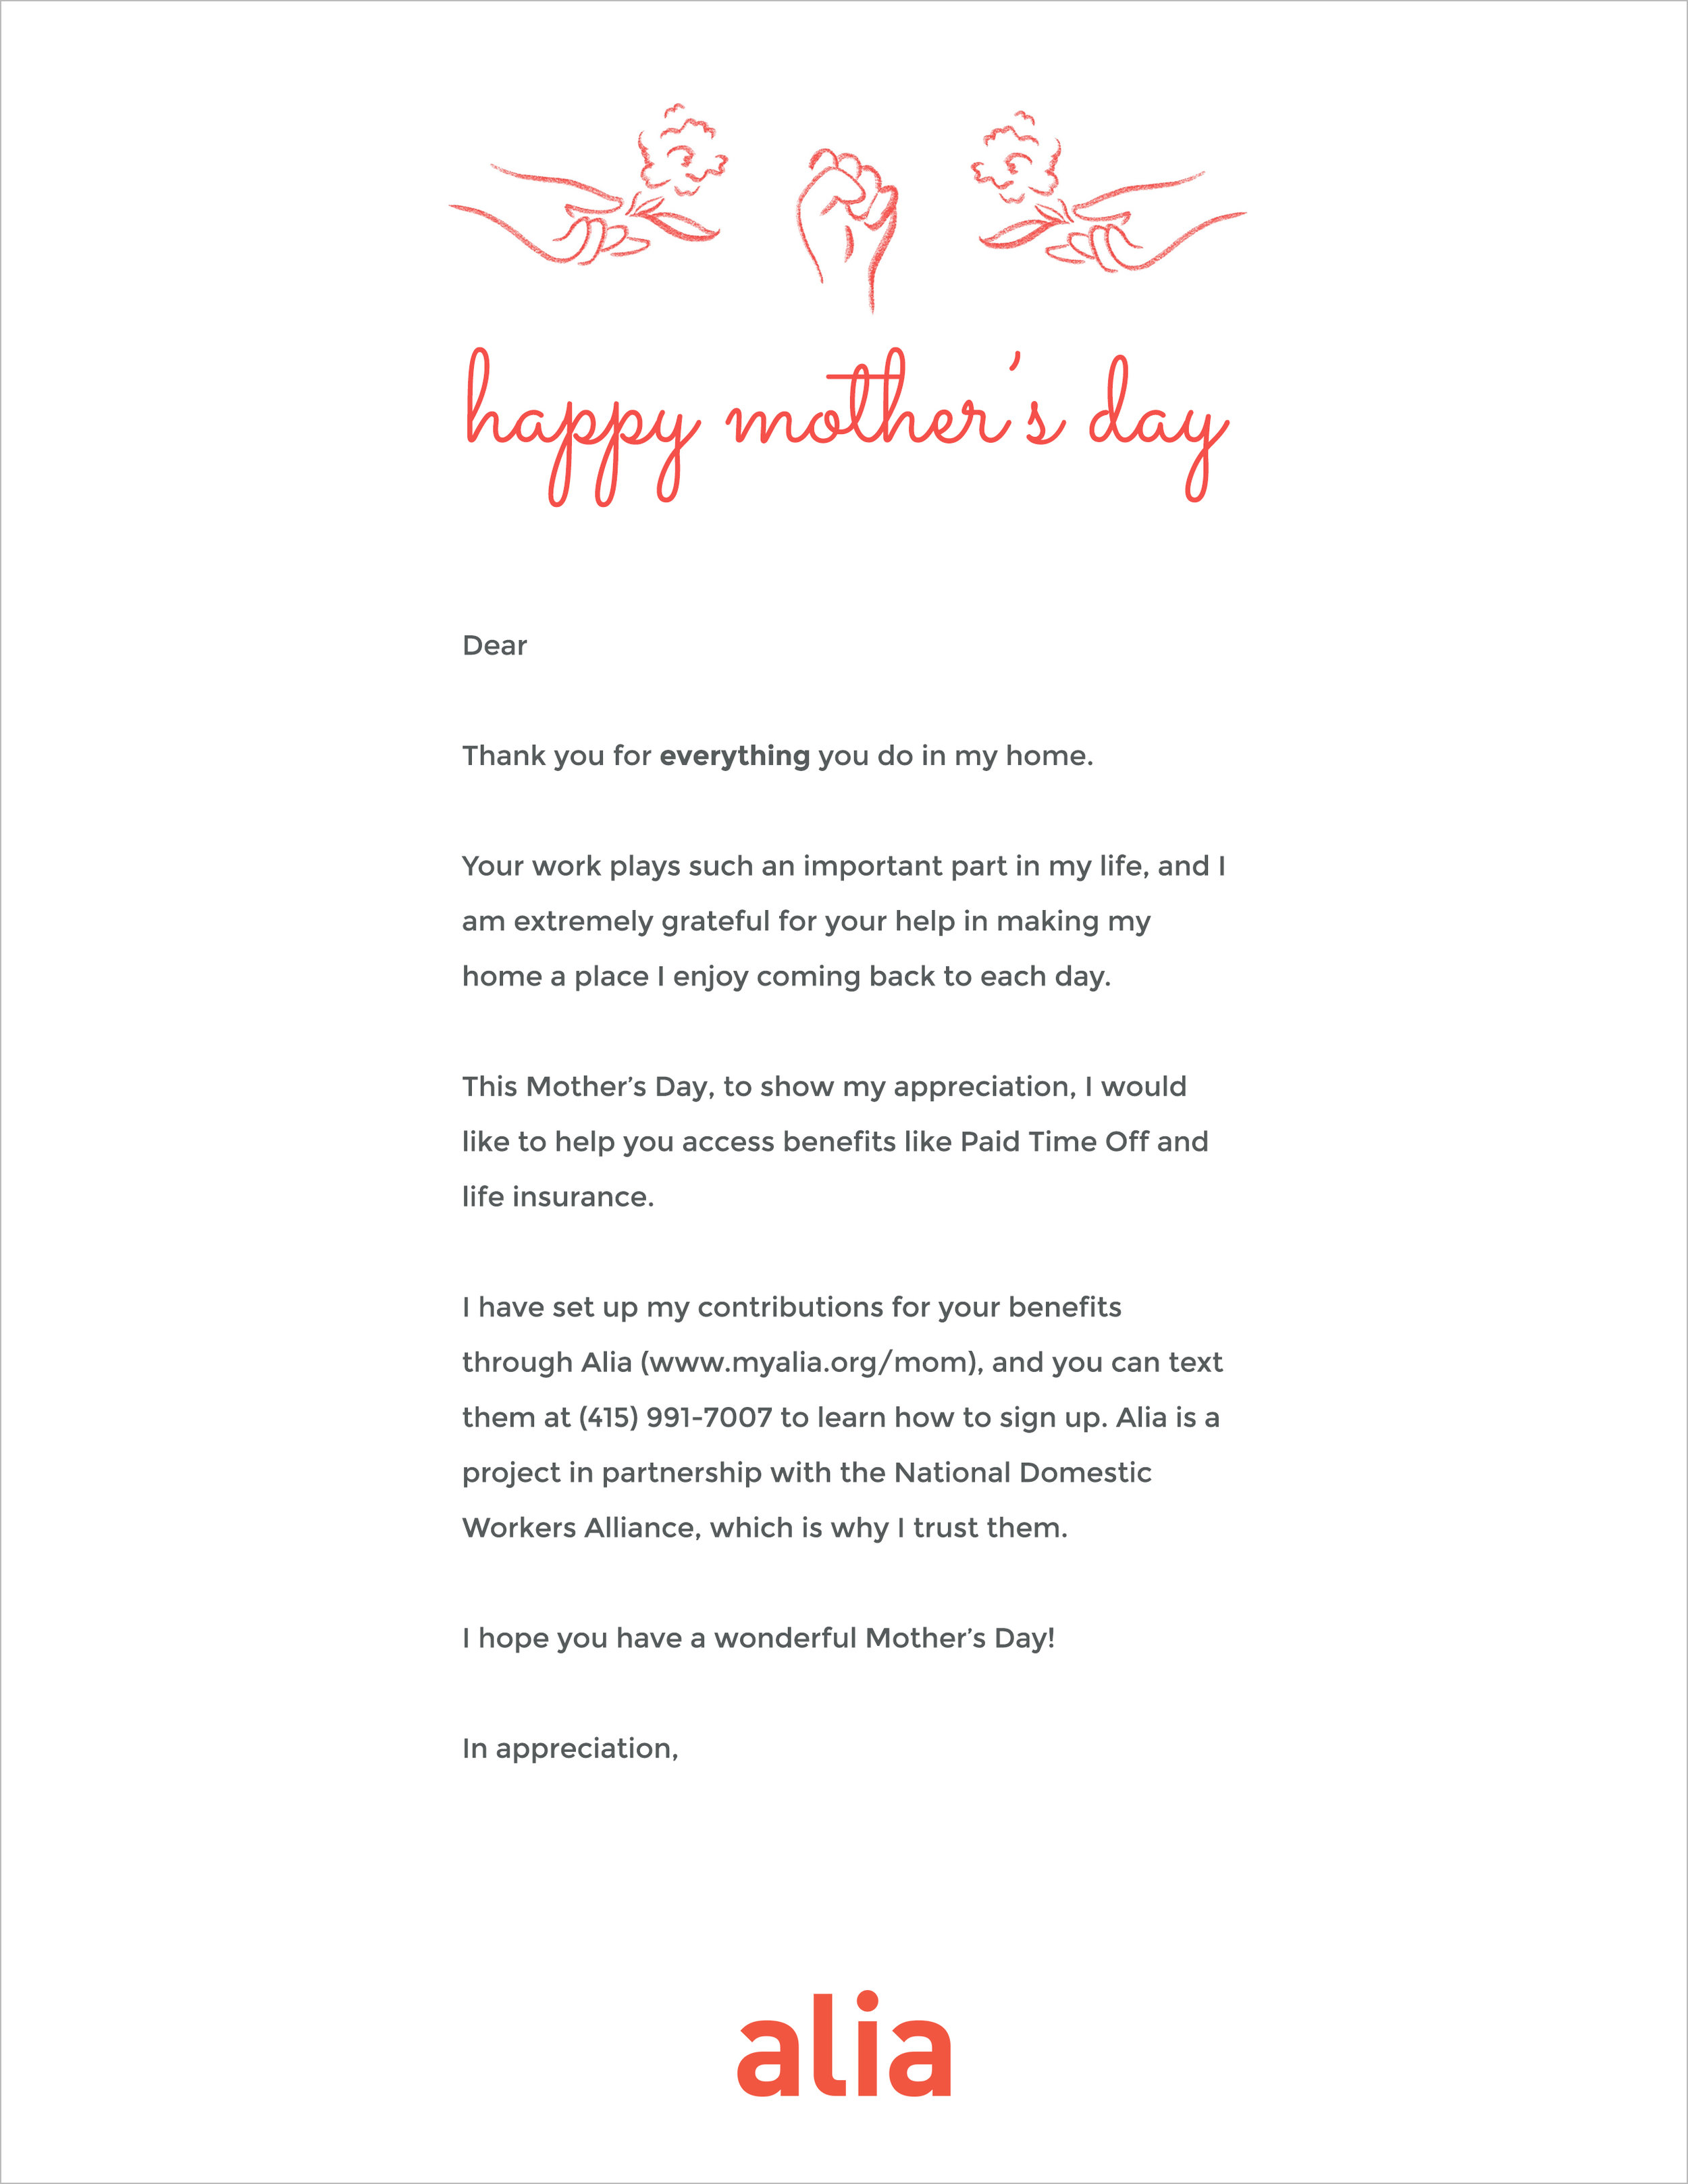 MothersDayCard_3_SS_English.jpg